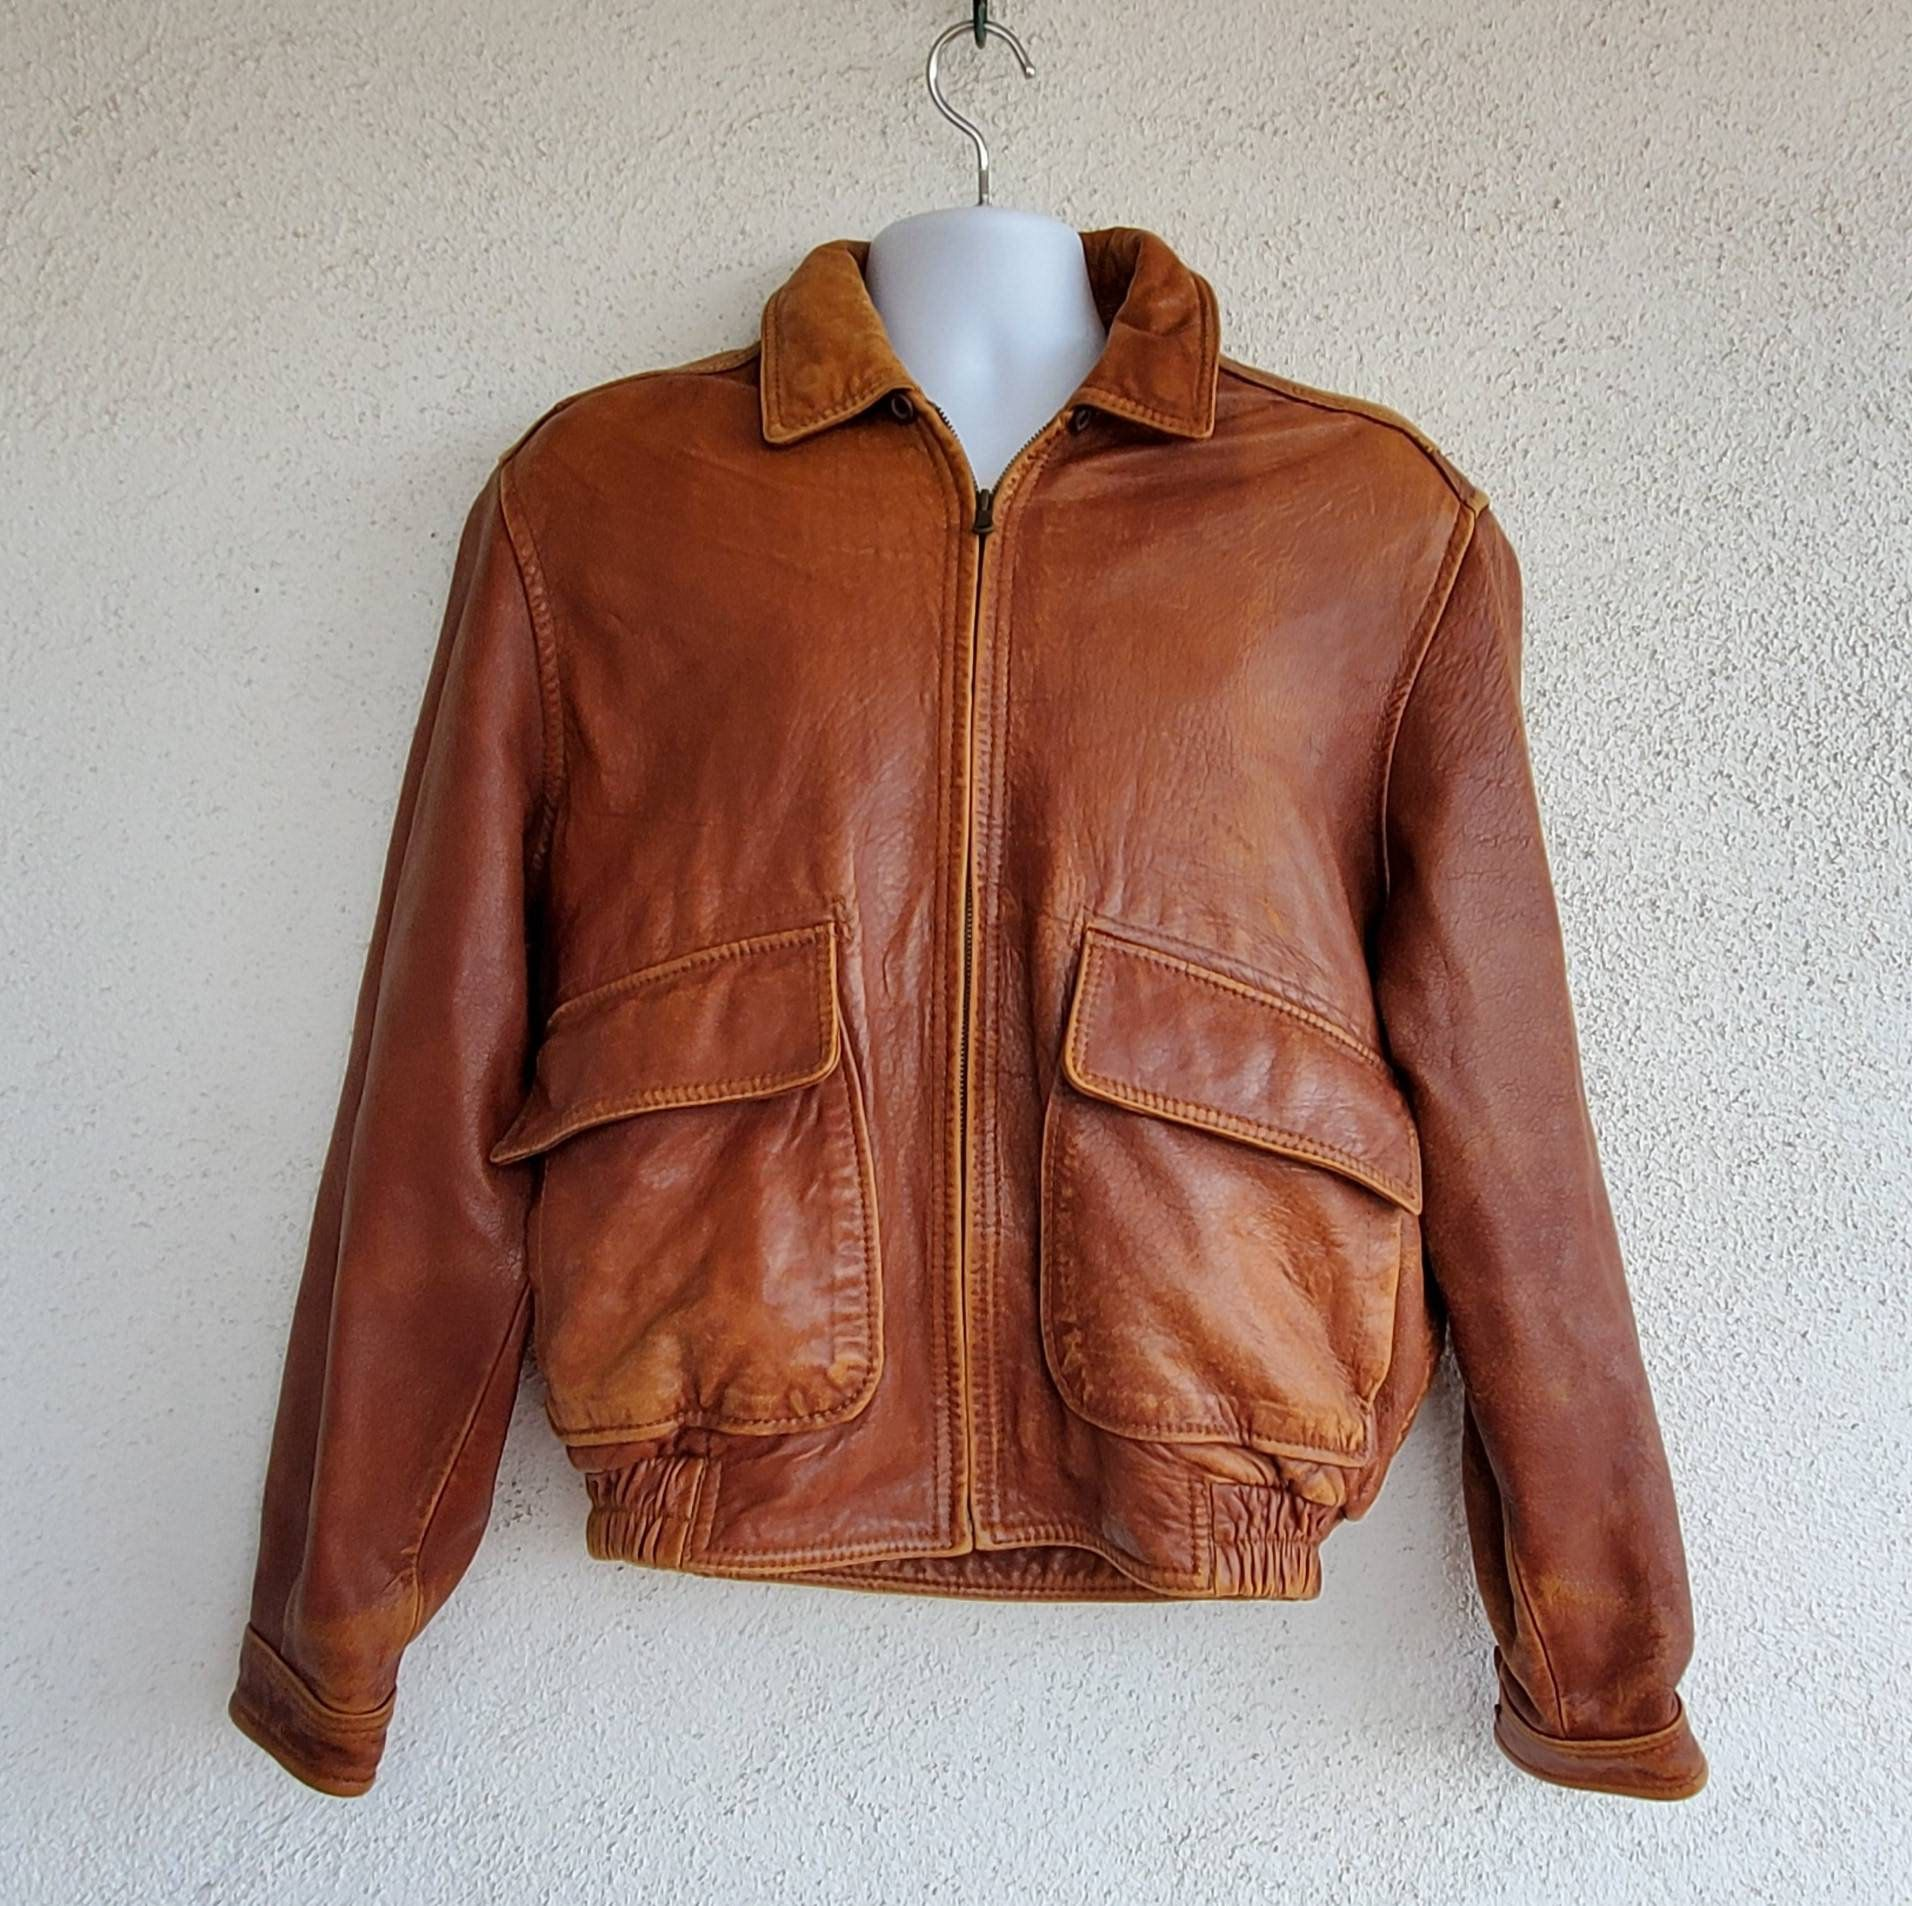 Men S Leather Jacket Wilson S Brown Leather Jacket Etsy Brown Leather Jacket Men Leather Jacket Leather Flight Jacket [ 1906 x 1912 Pixel ]